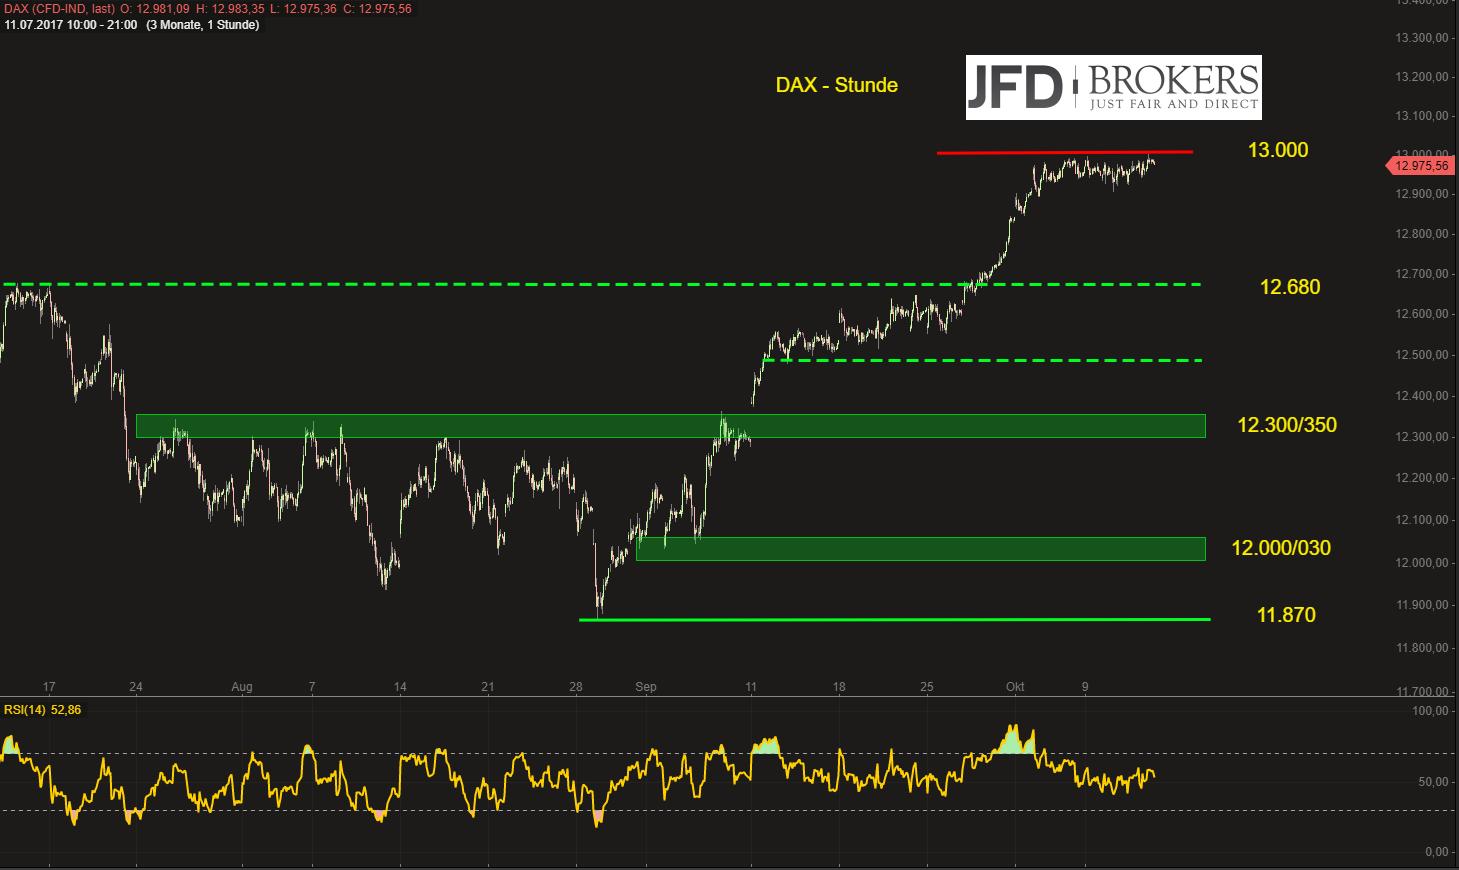 DAX-tippt-die-13-000-an-doch-weitere-Action-bleibt-aus-Kommentar-JFD-Brokers-GodmodeTrader.de-2